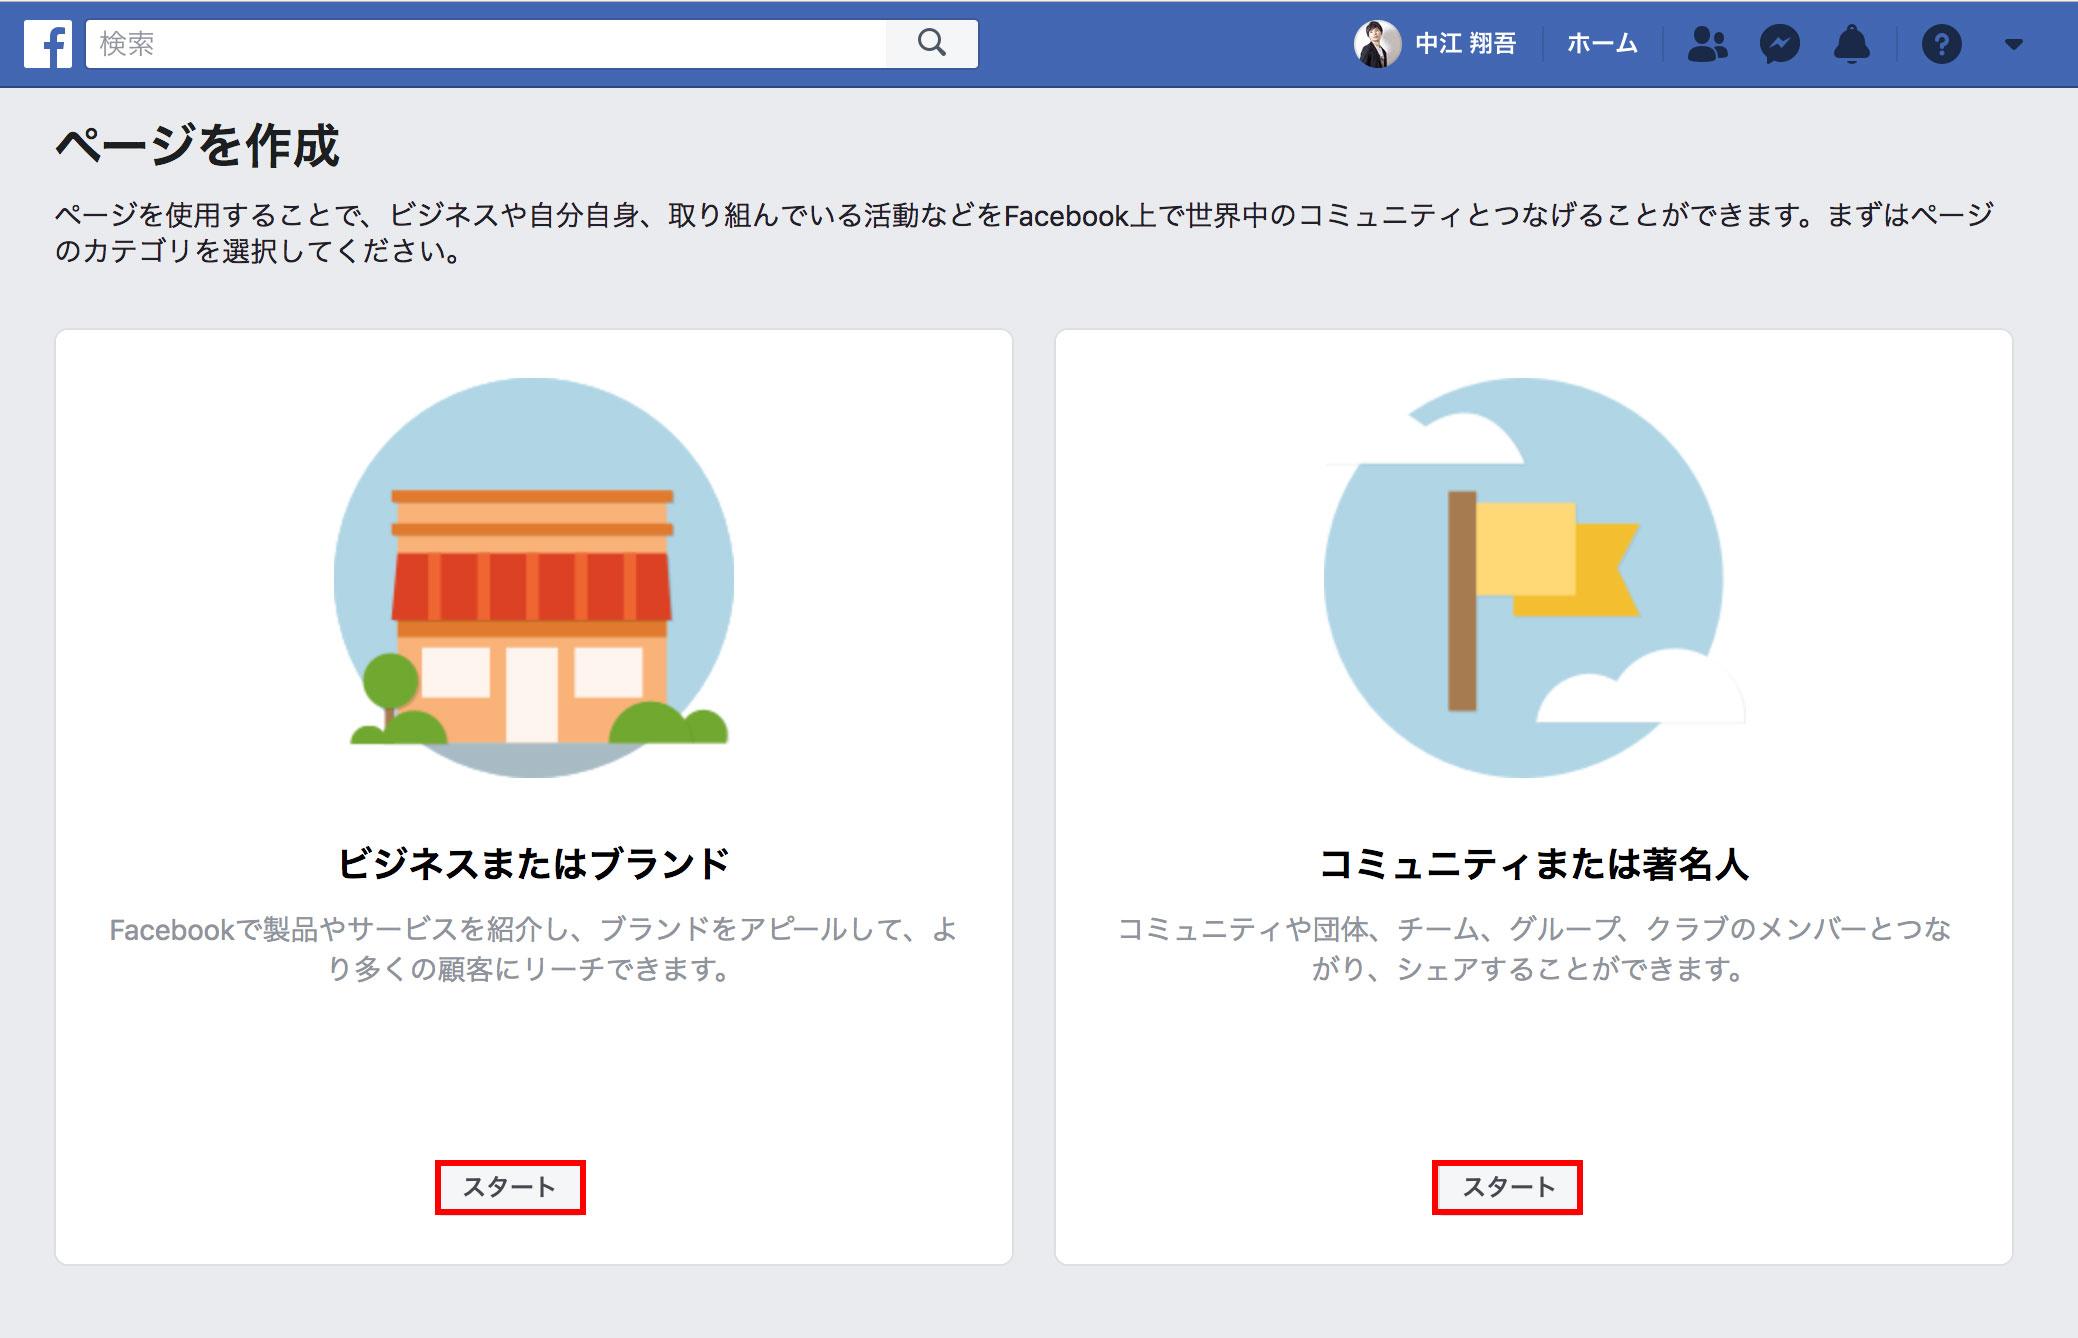 Facebookページのカテゴリー選択画面